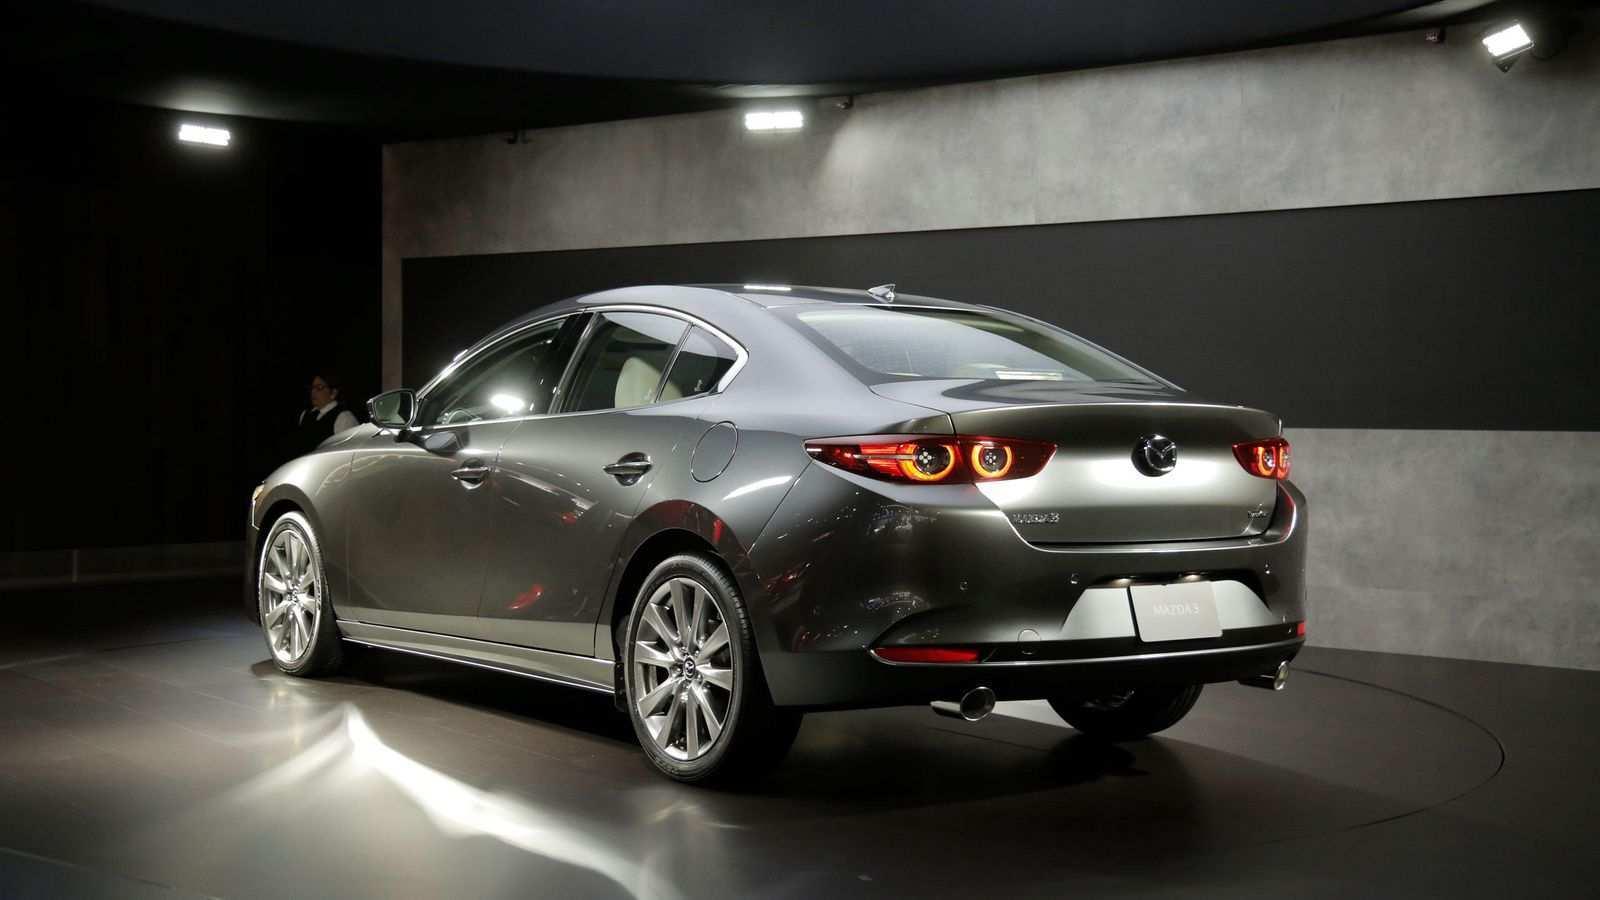 52 All New Mazda 3 2020 Hybrid Model for Mazda 3 2020 Hybrid